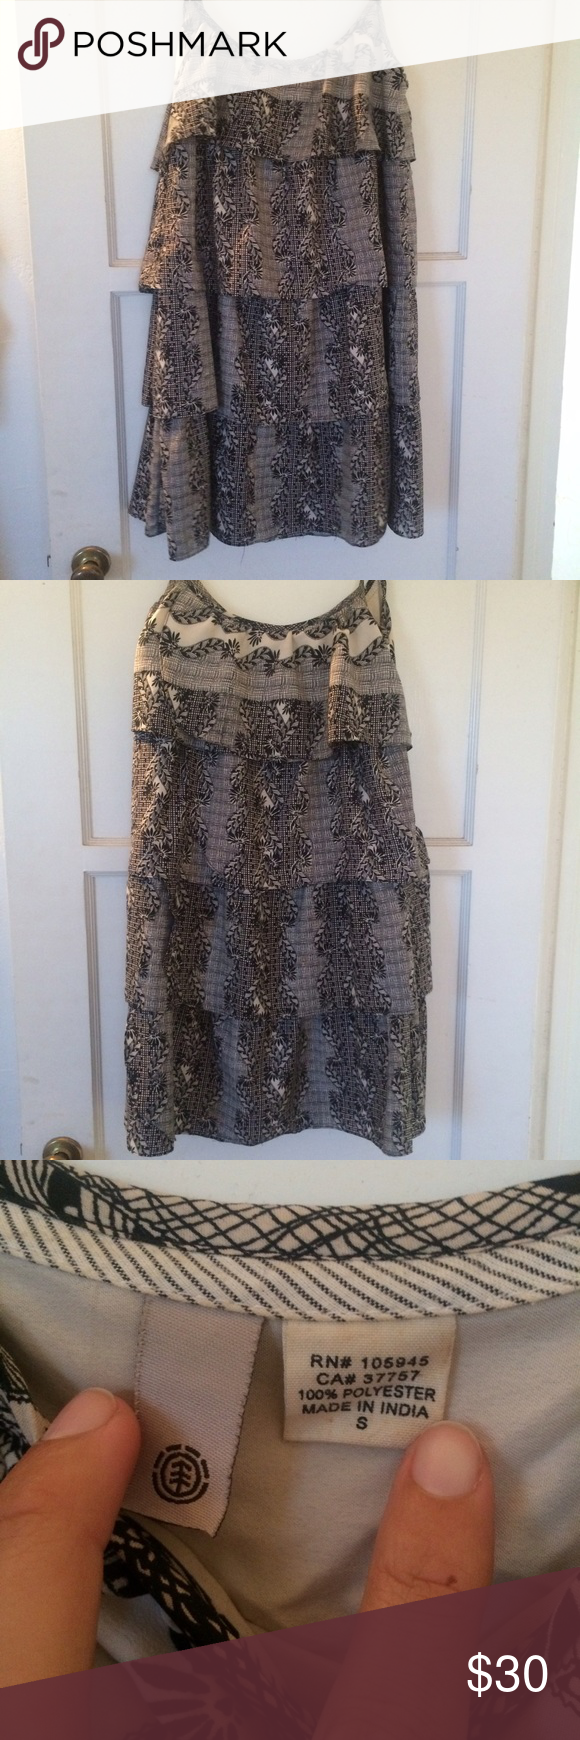 Lbd black and white patterned dress Small Ezekiel mini dress with spaghetti straps and ruffled layers Ezekiel Dresses Mini